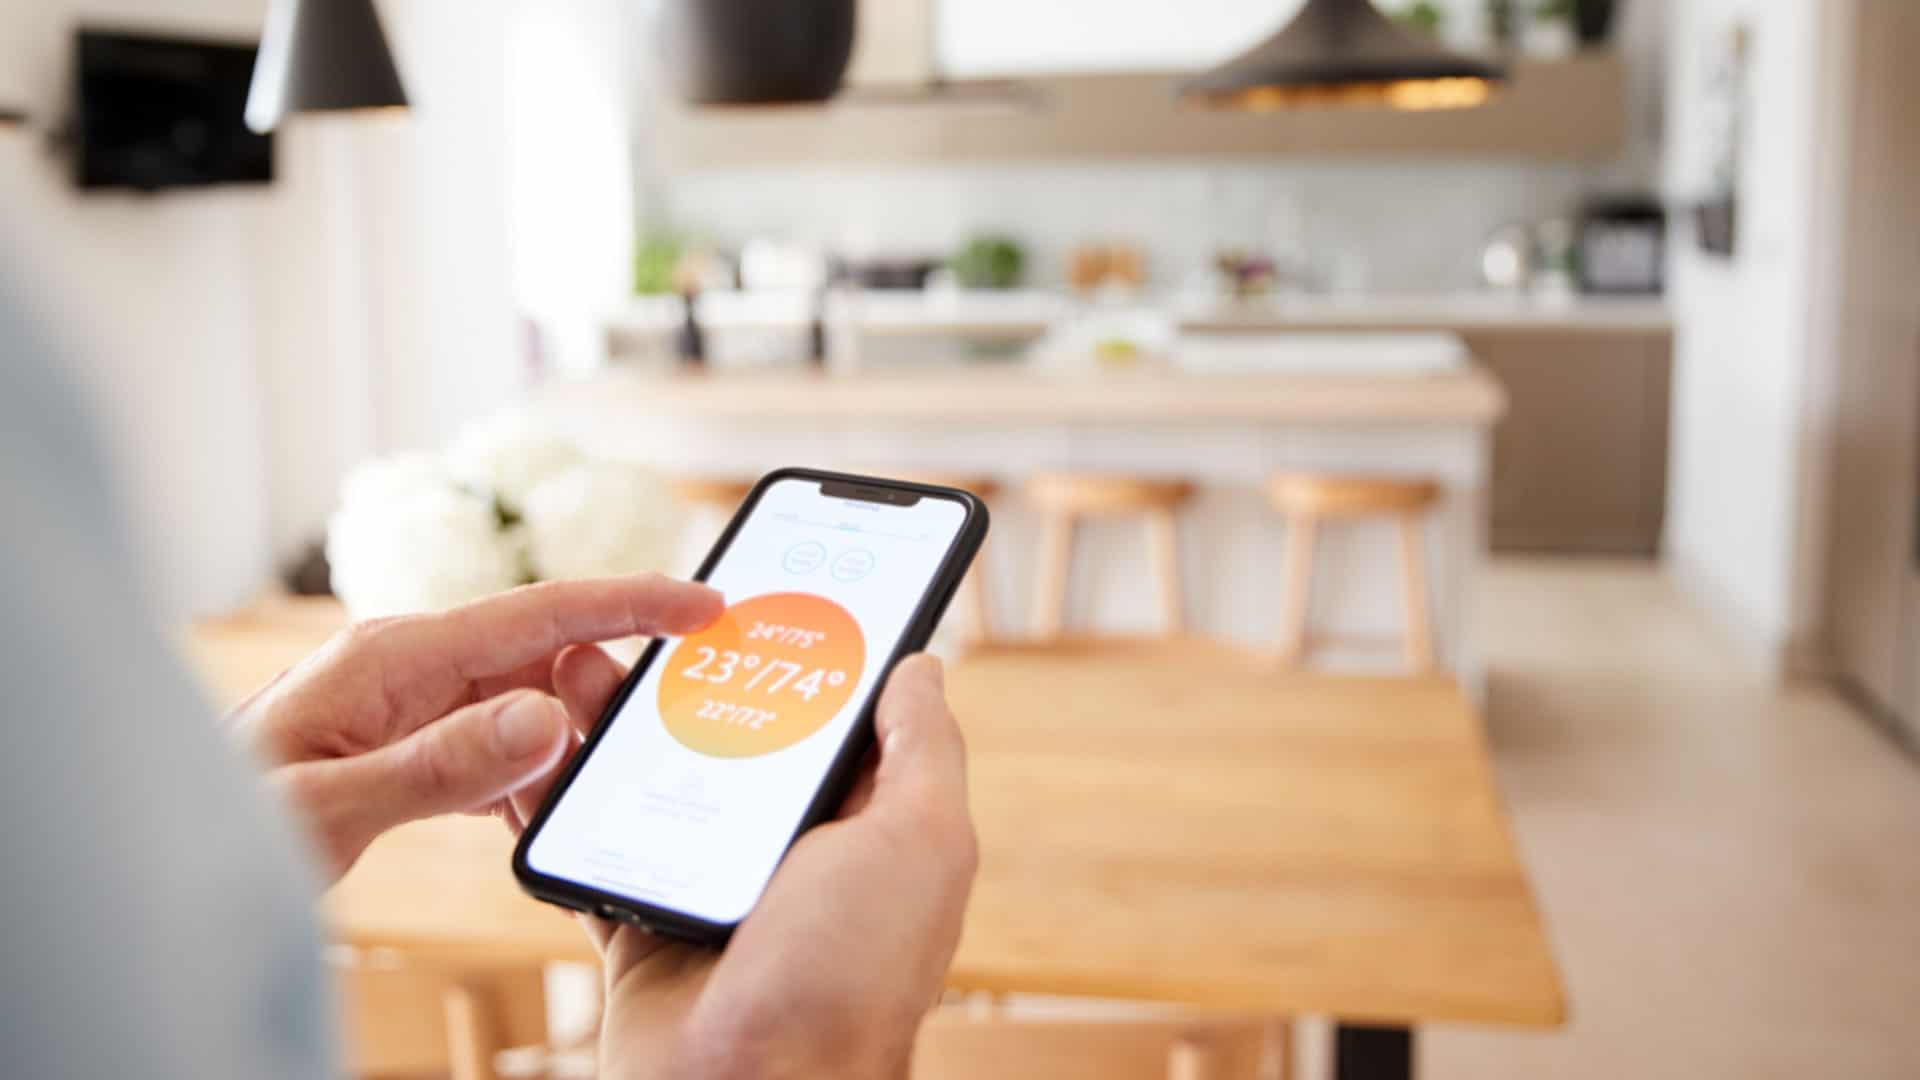 Frau mit Smartphone an Smart Home Heizung